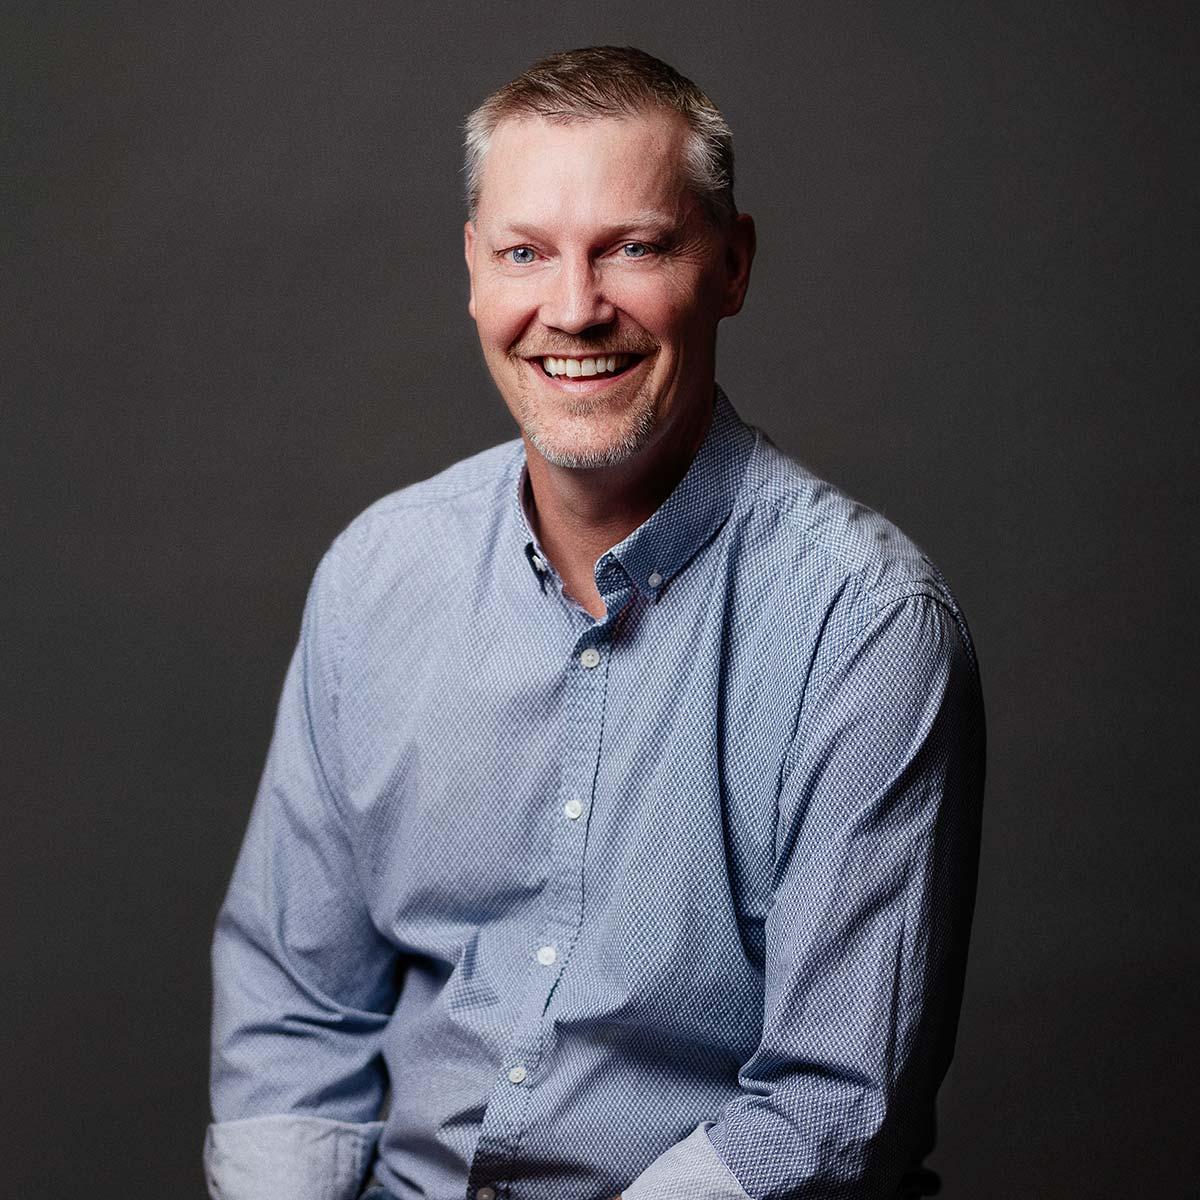 David Oberg - Head of User Experience